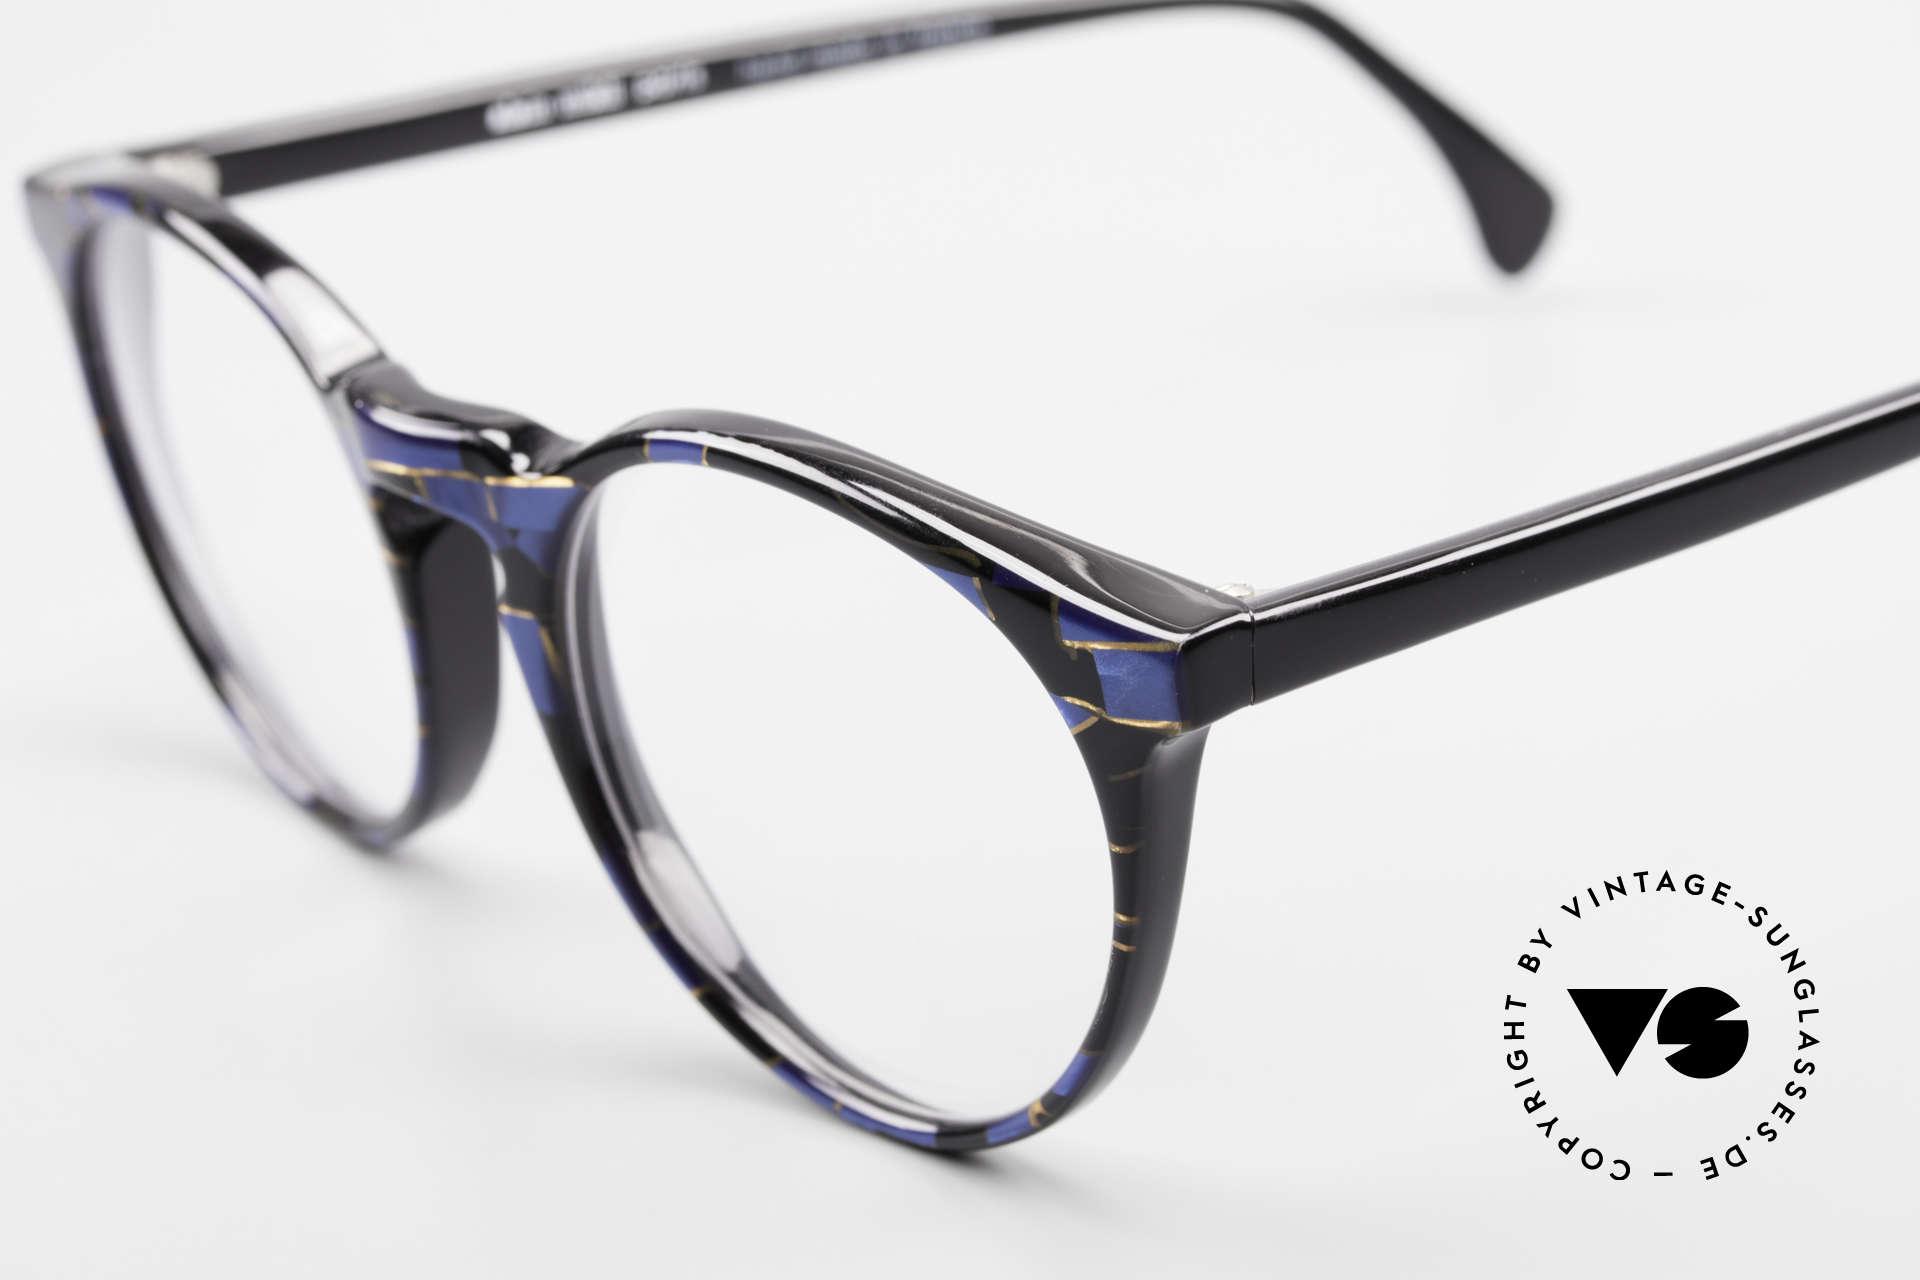 Alain Mikli 034 / 898 Panto Designer Eyeglasses, never worn (like all our vintage Alain Mikli specs), Made for Men and Women